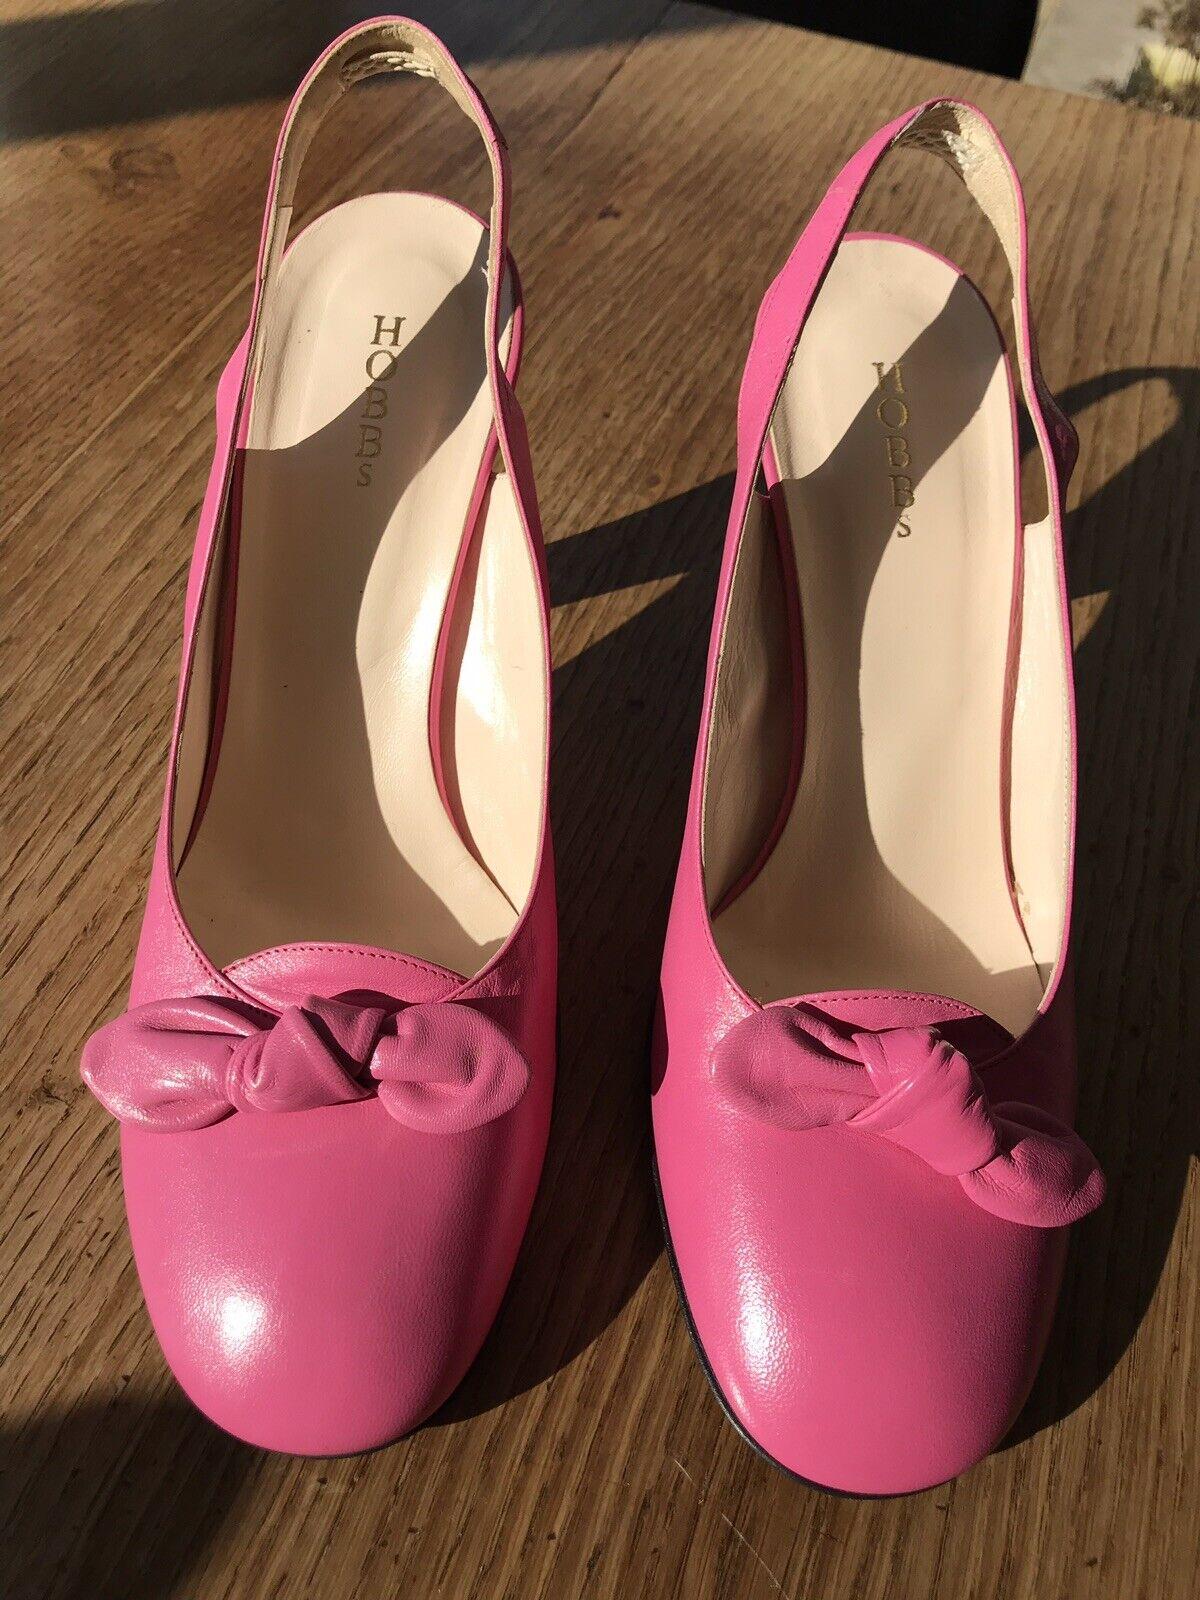 Women's HOBBS bubblegum pink sling back shoes, size 40 UK7